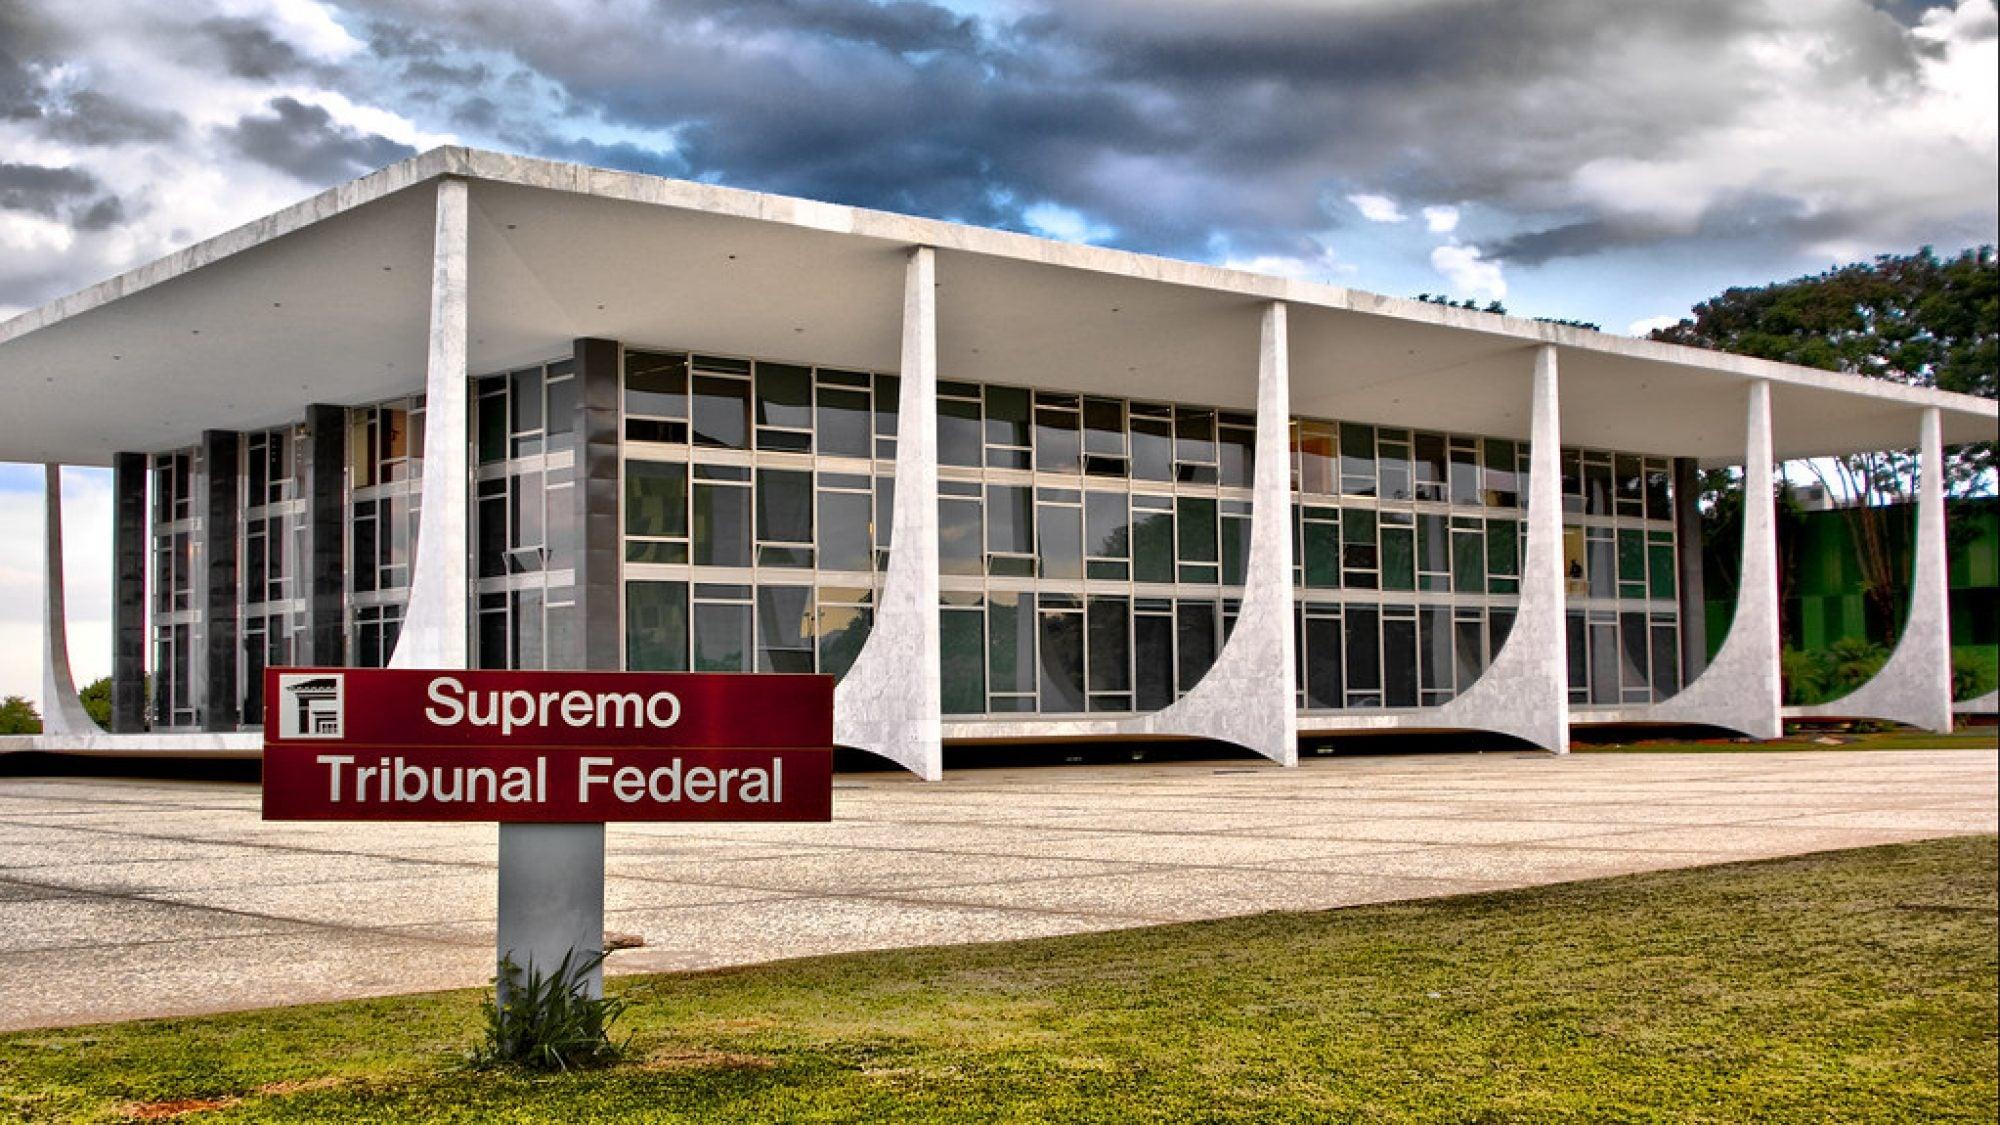 Brazilian Supreme Court building